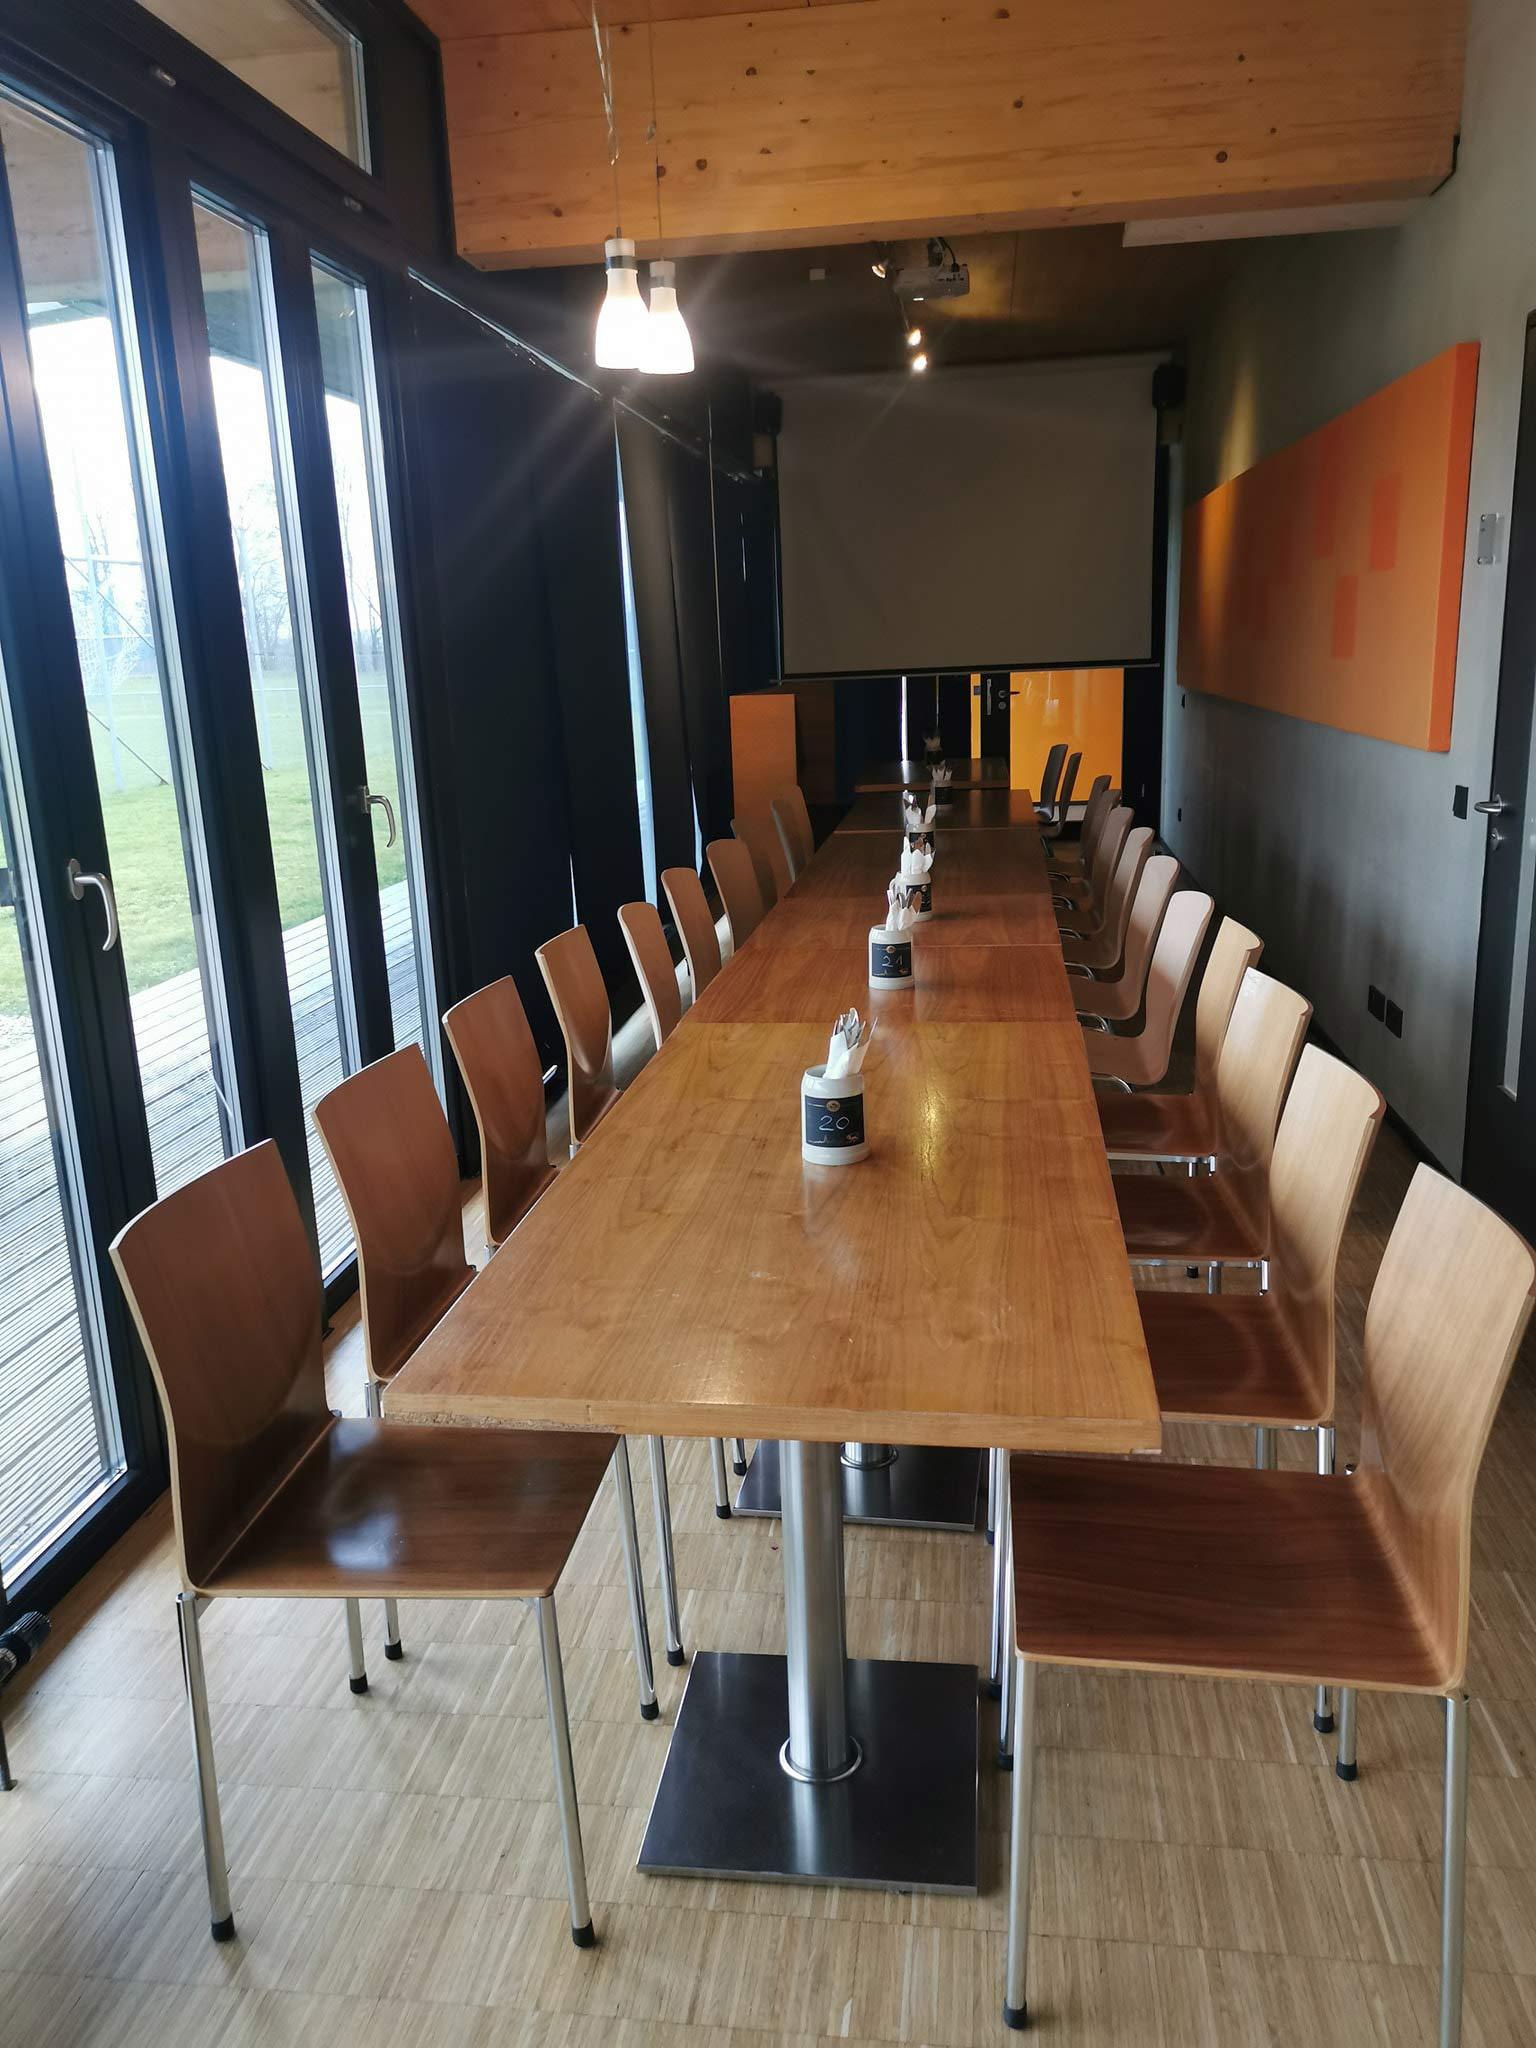 Restaurant Halde Ulm-Gögglingen - Fernsehzimmer